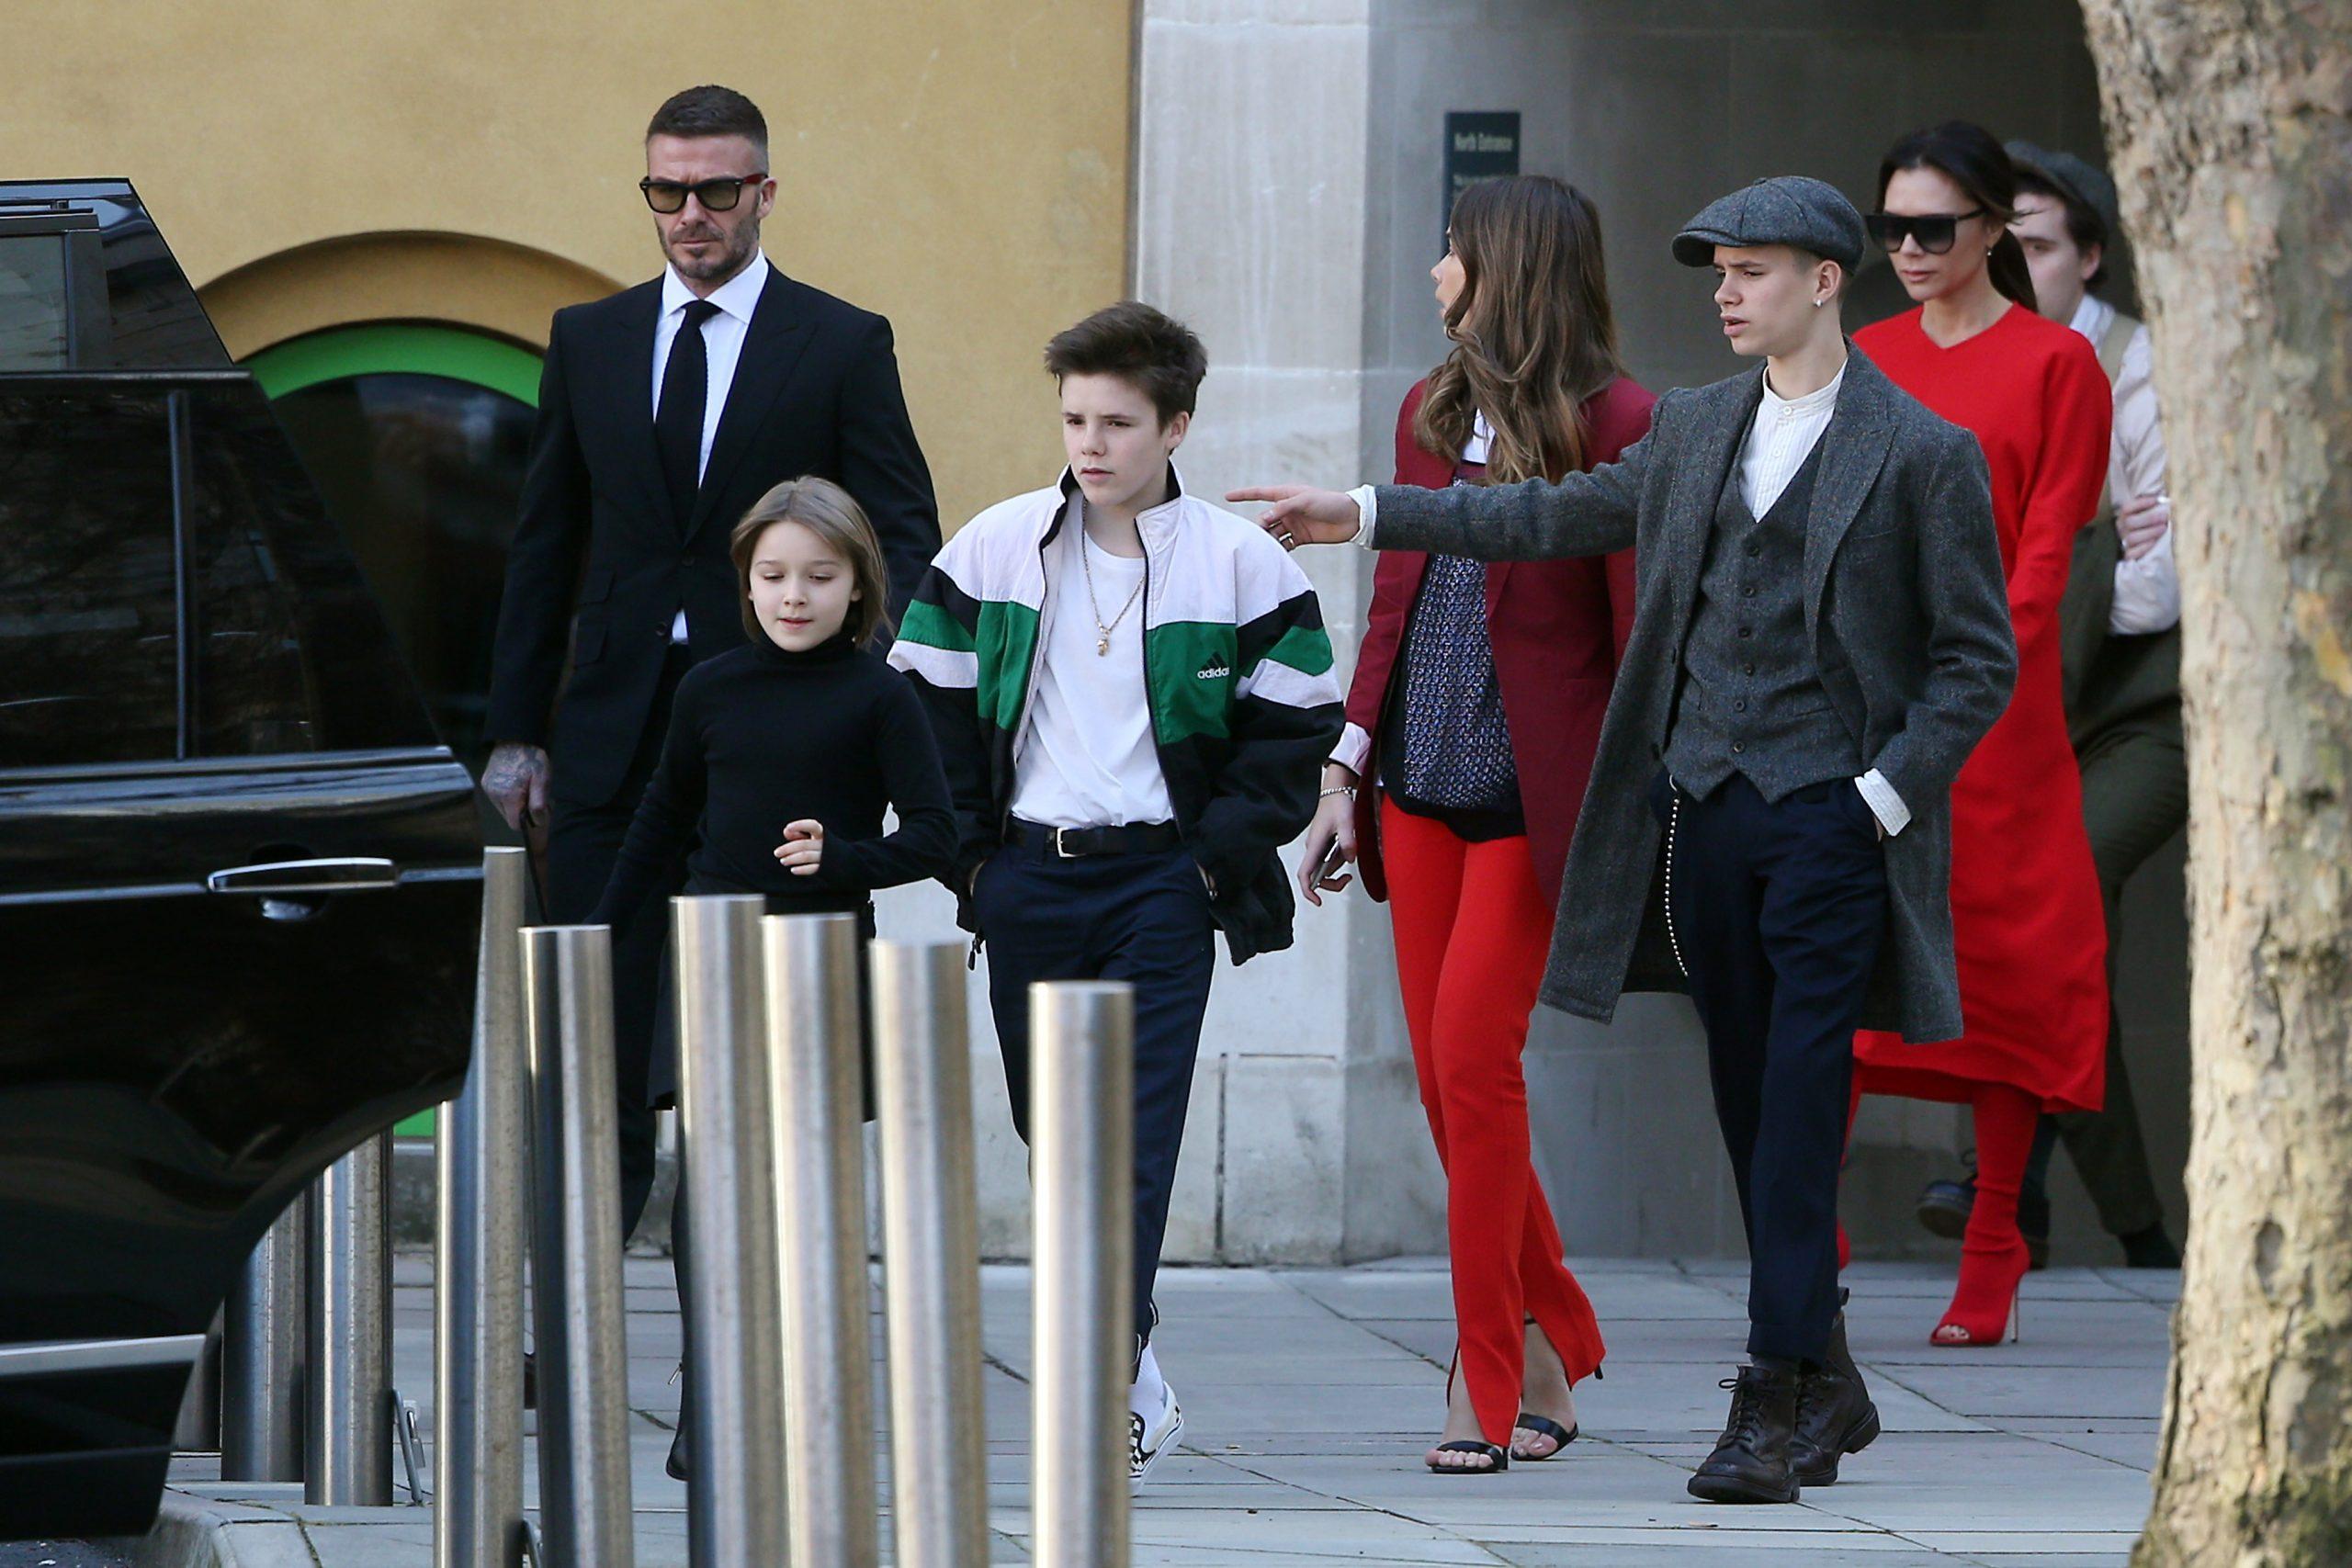 Victoria Beckham, David Beckham and family